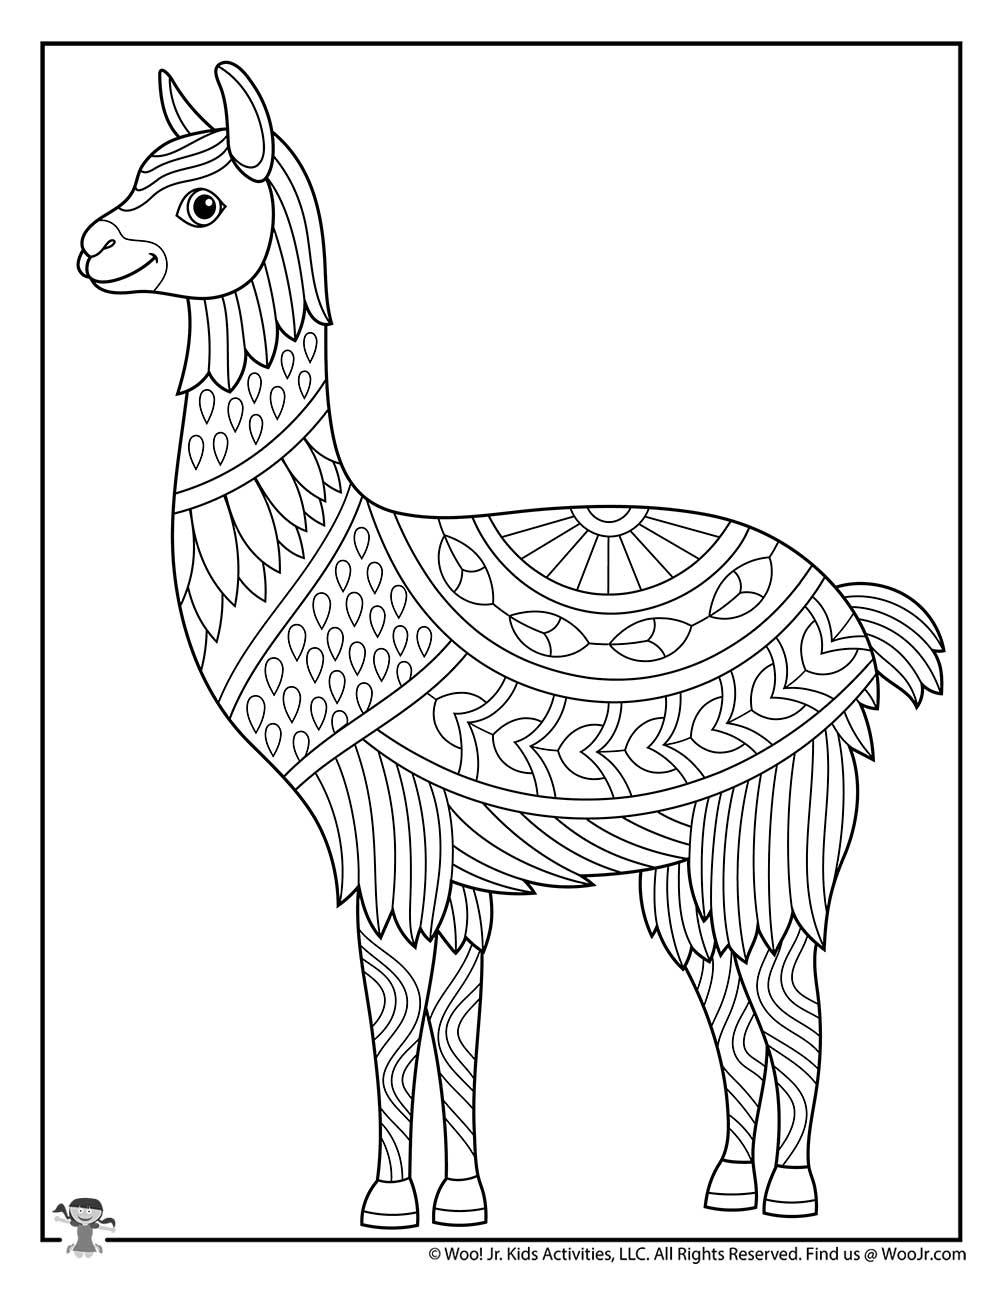 Llama Easy Adult Coloring Animals | Woo! Jr. Kids Activities